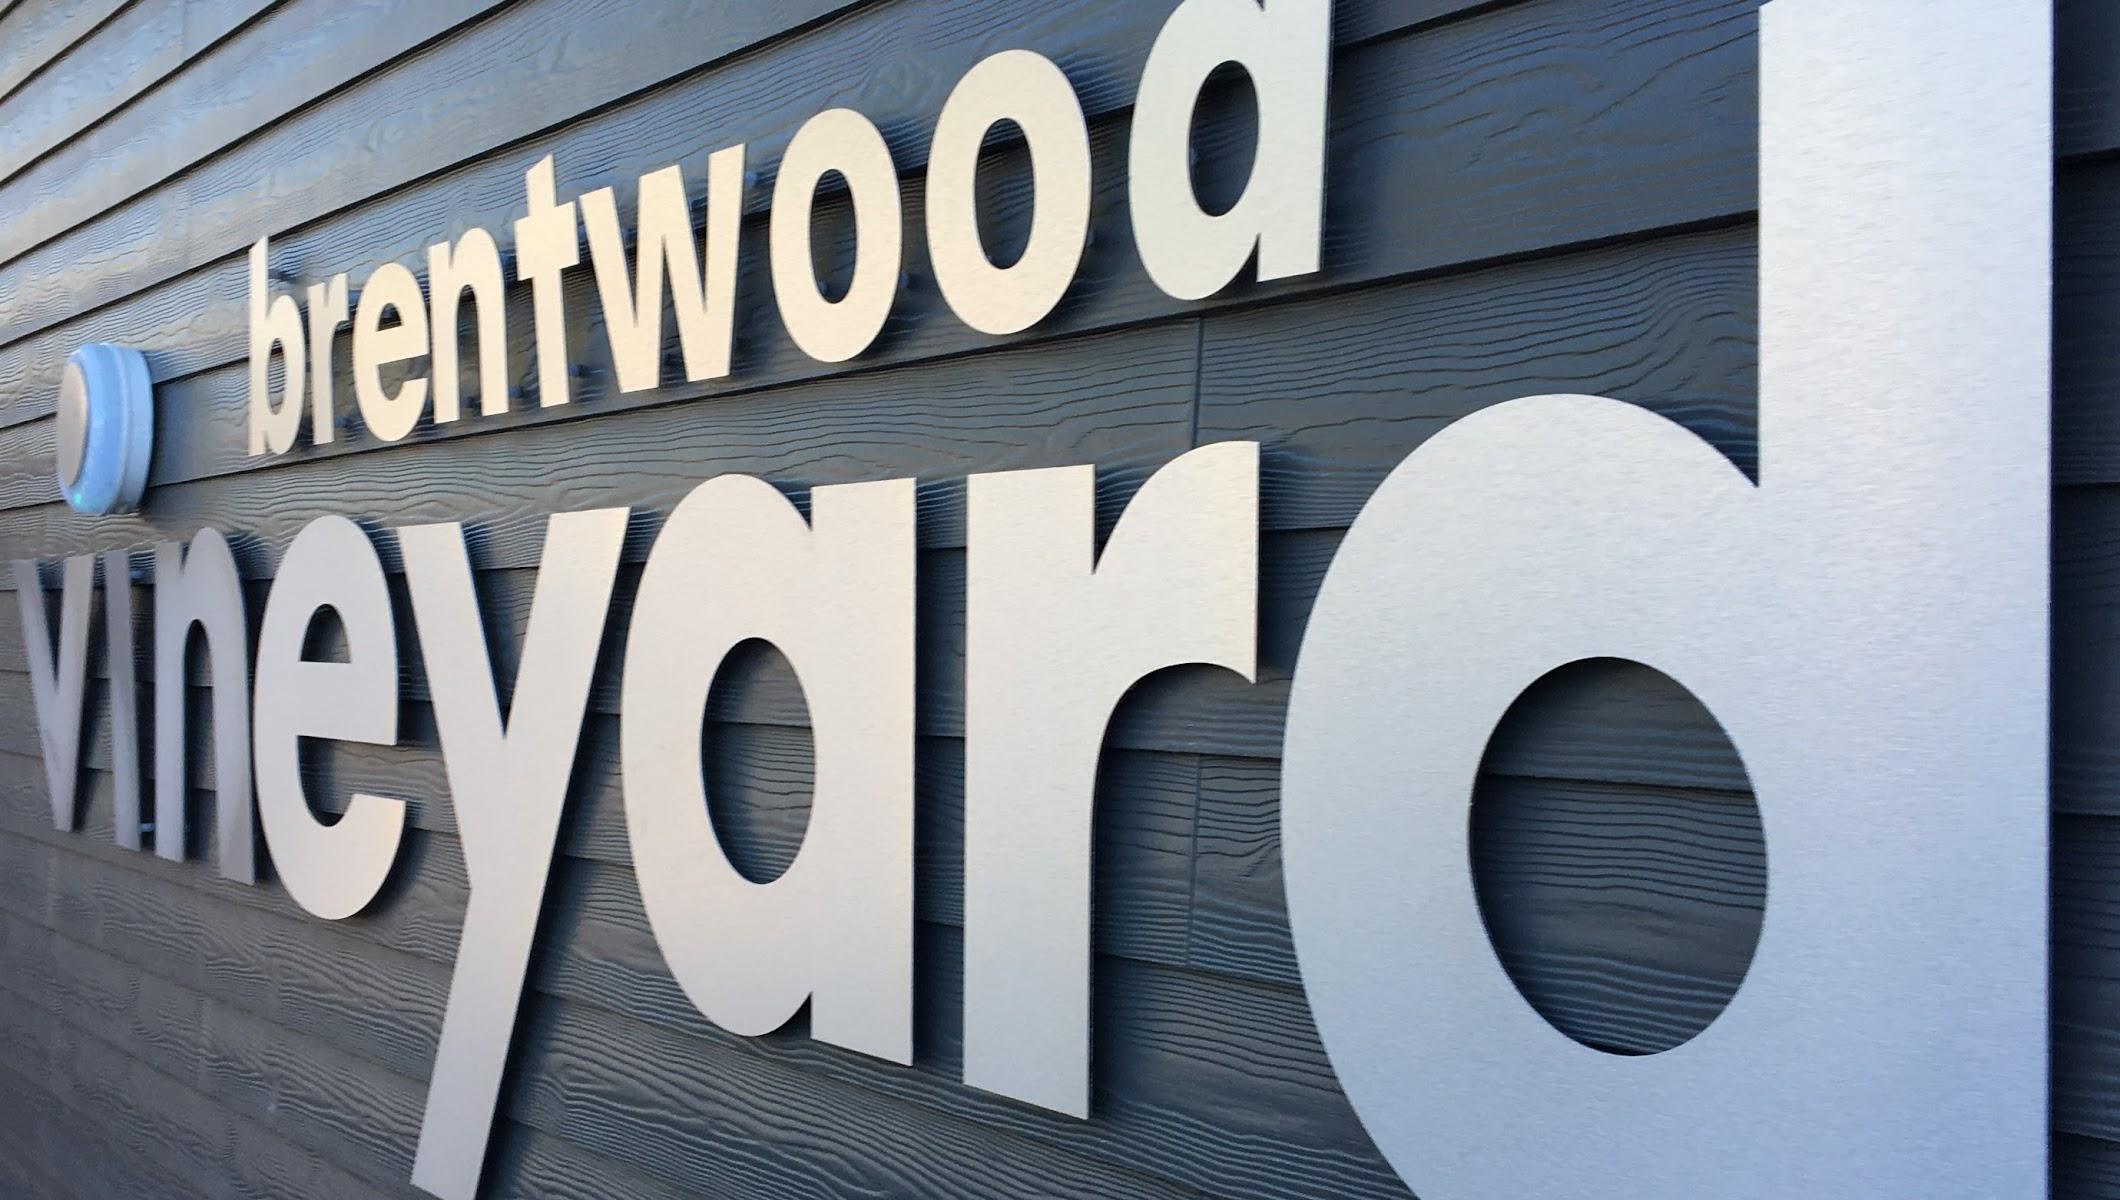 Brentwood Vineyard Church